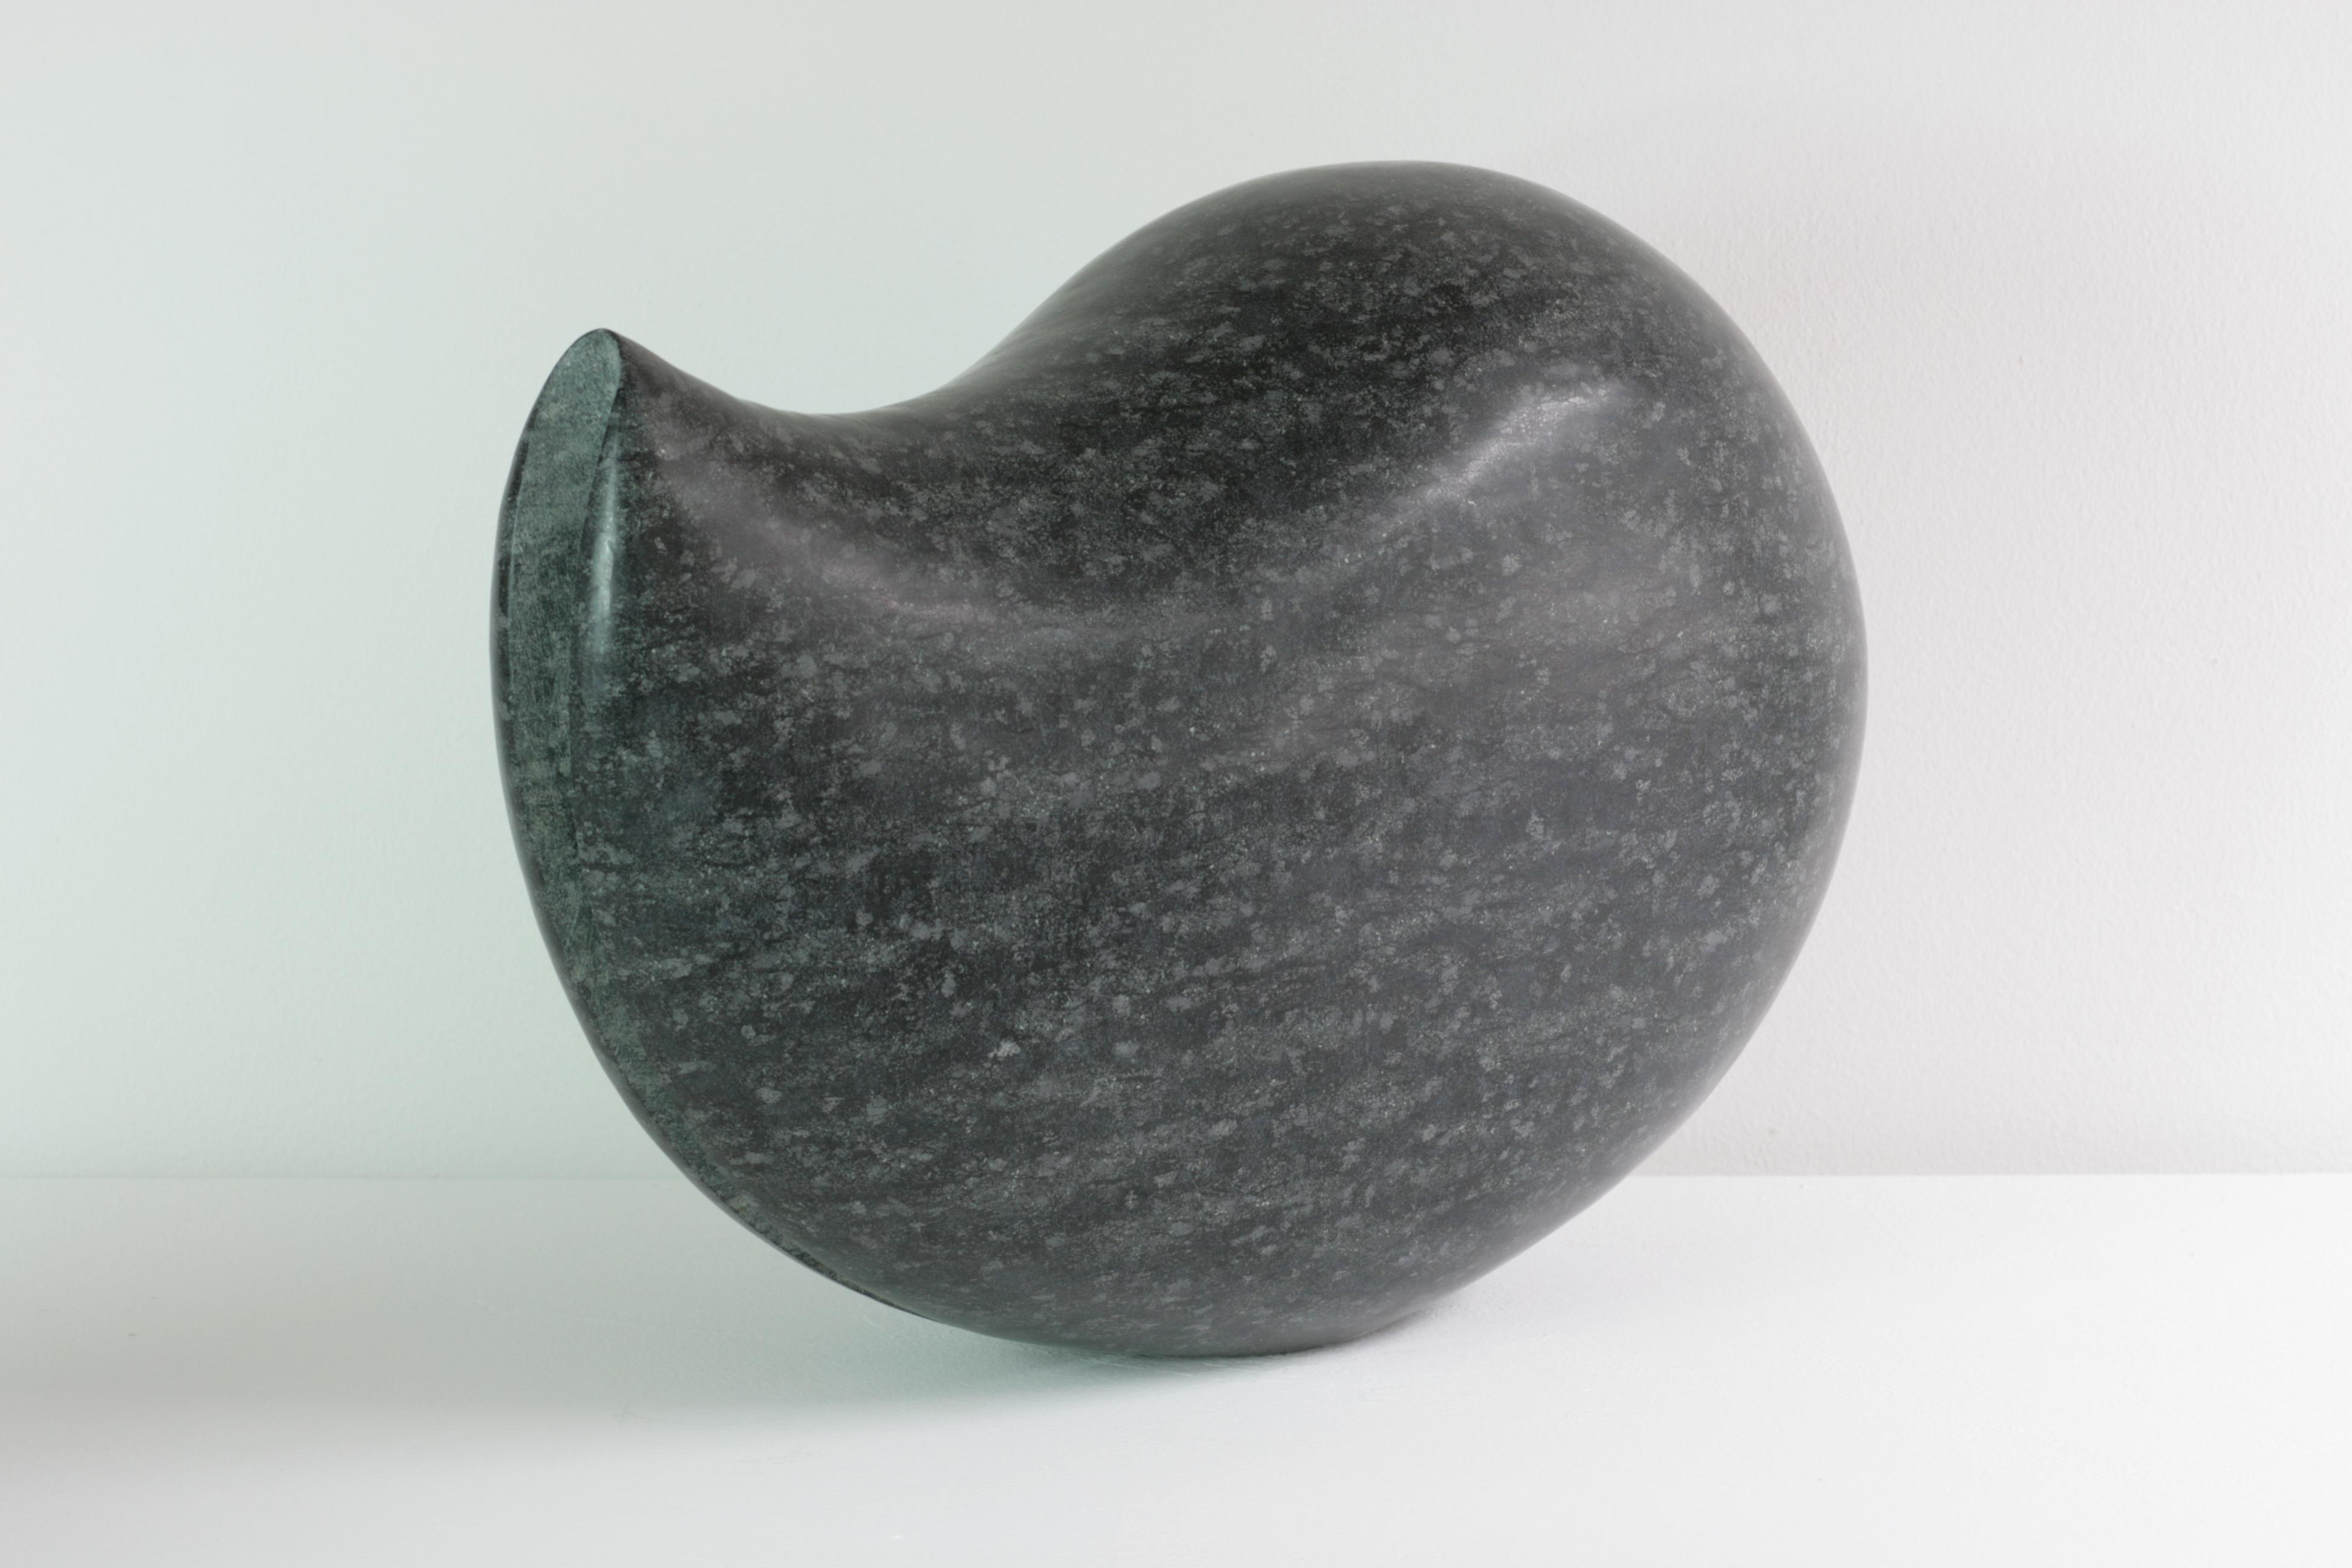 Regina Schnersch, Faltung II, 2009, Diabas, 42 x 20 x 30 cm